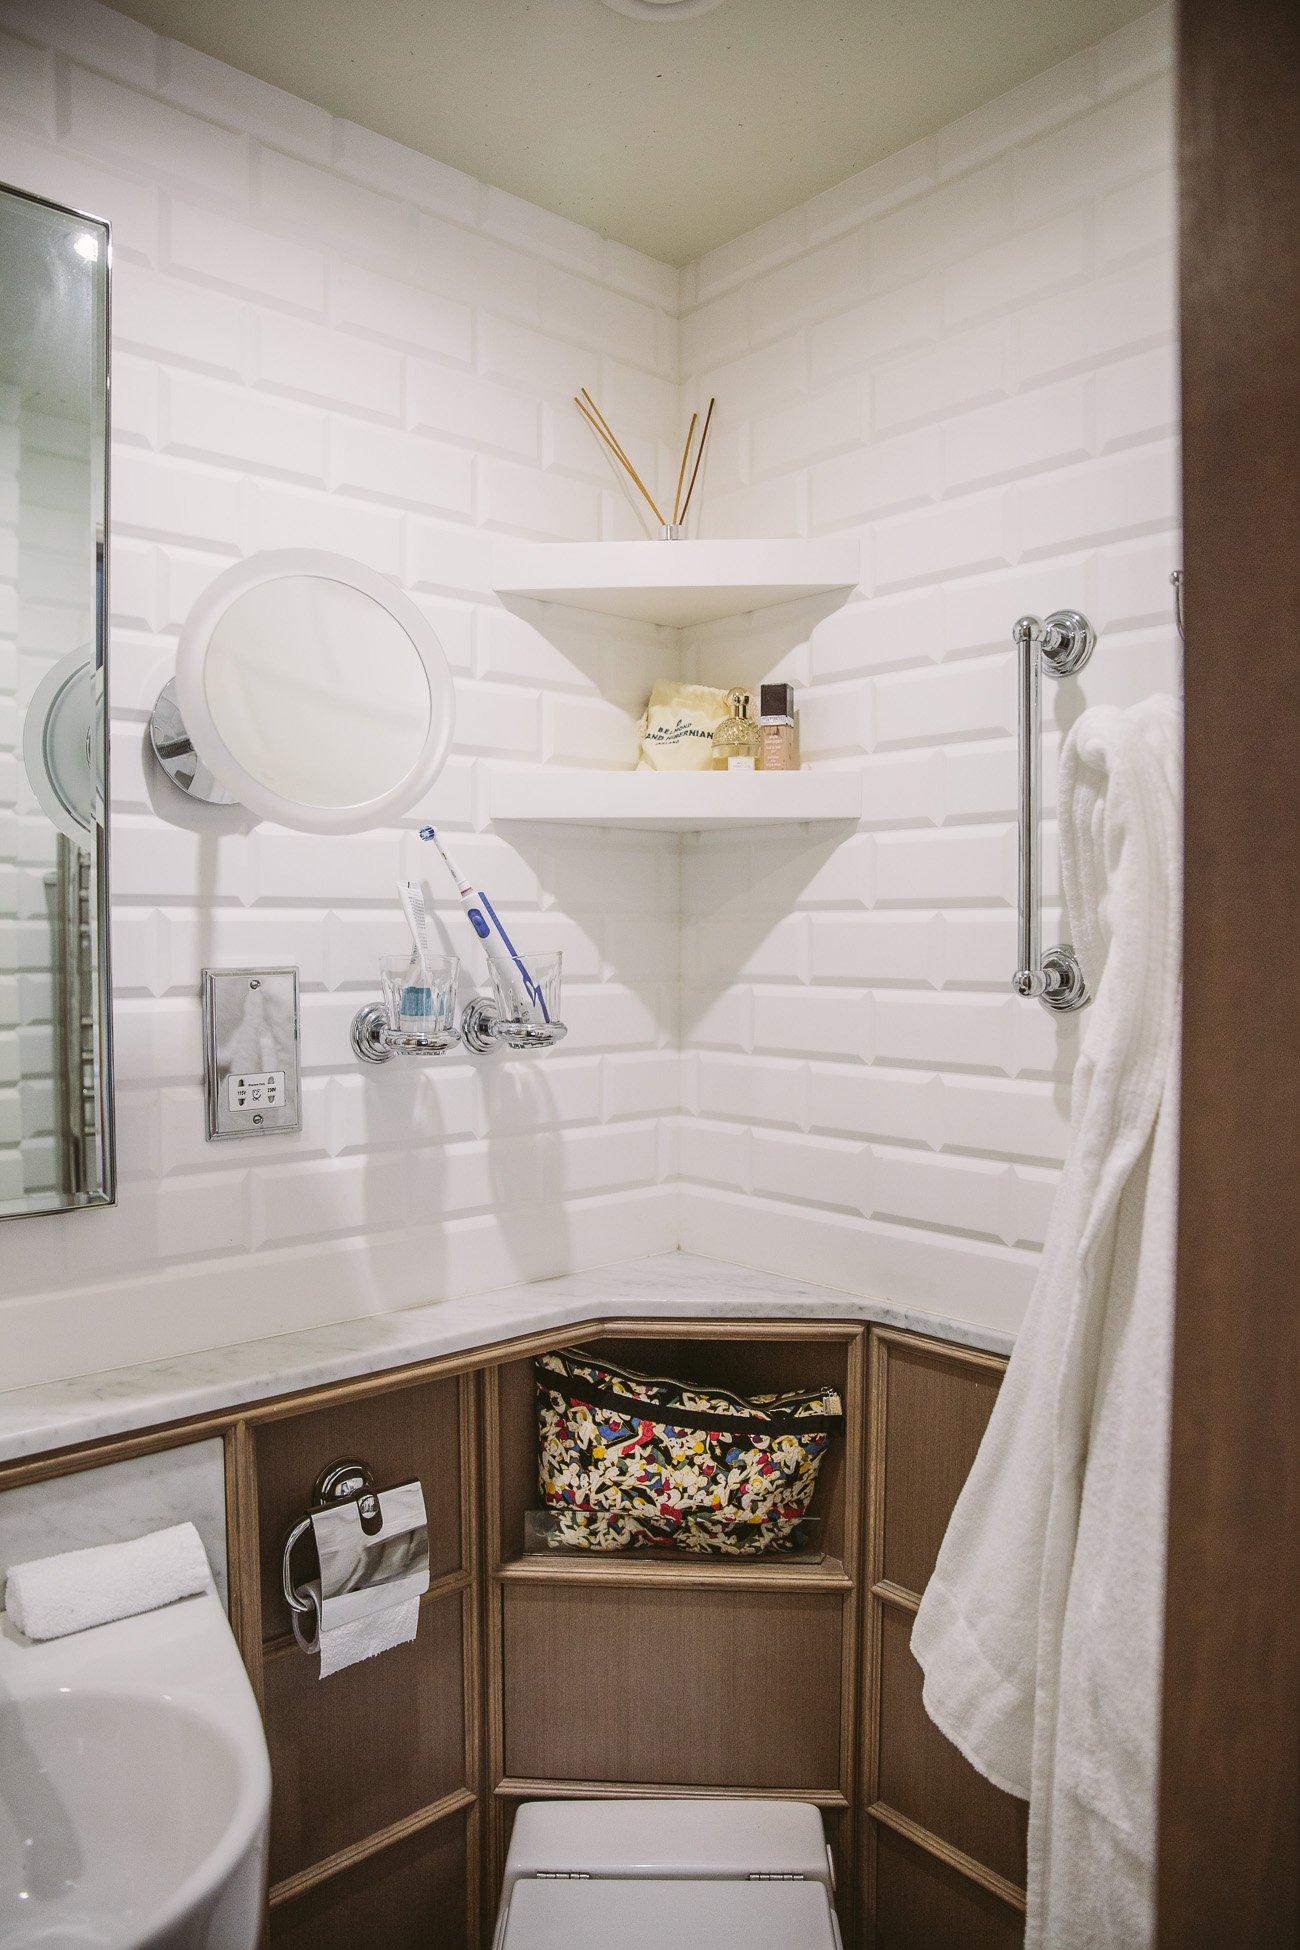 Bathroom at the Belmond Grand Hibernian